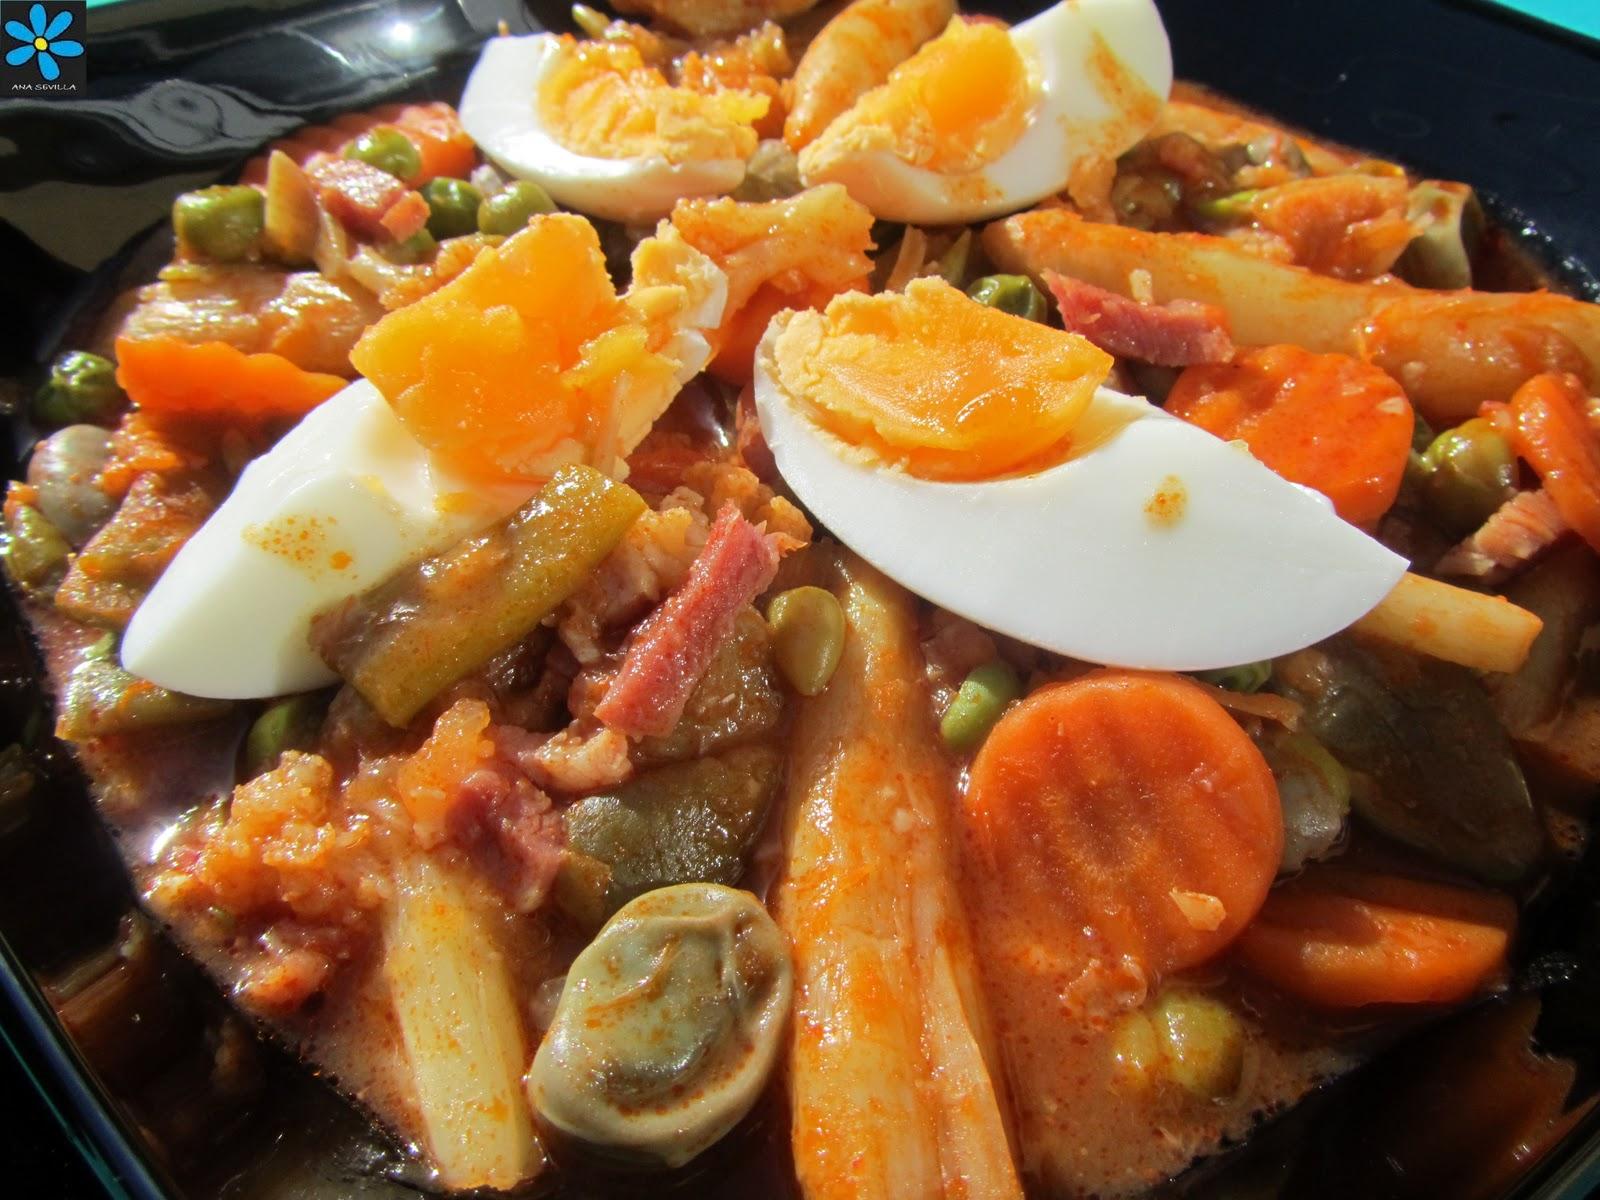 Menestra de verduras r pida - Menestra de verduras en texturas ...